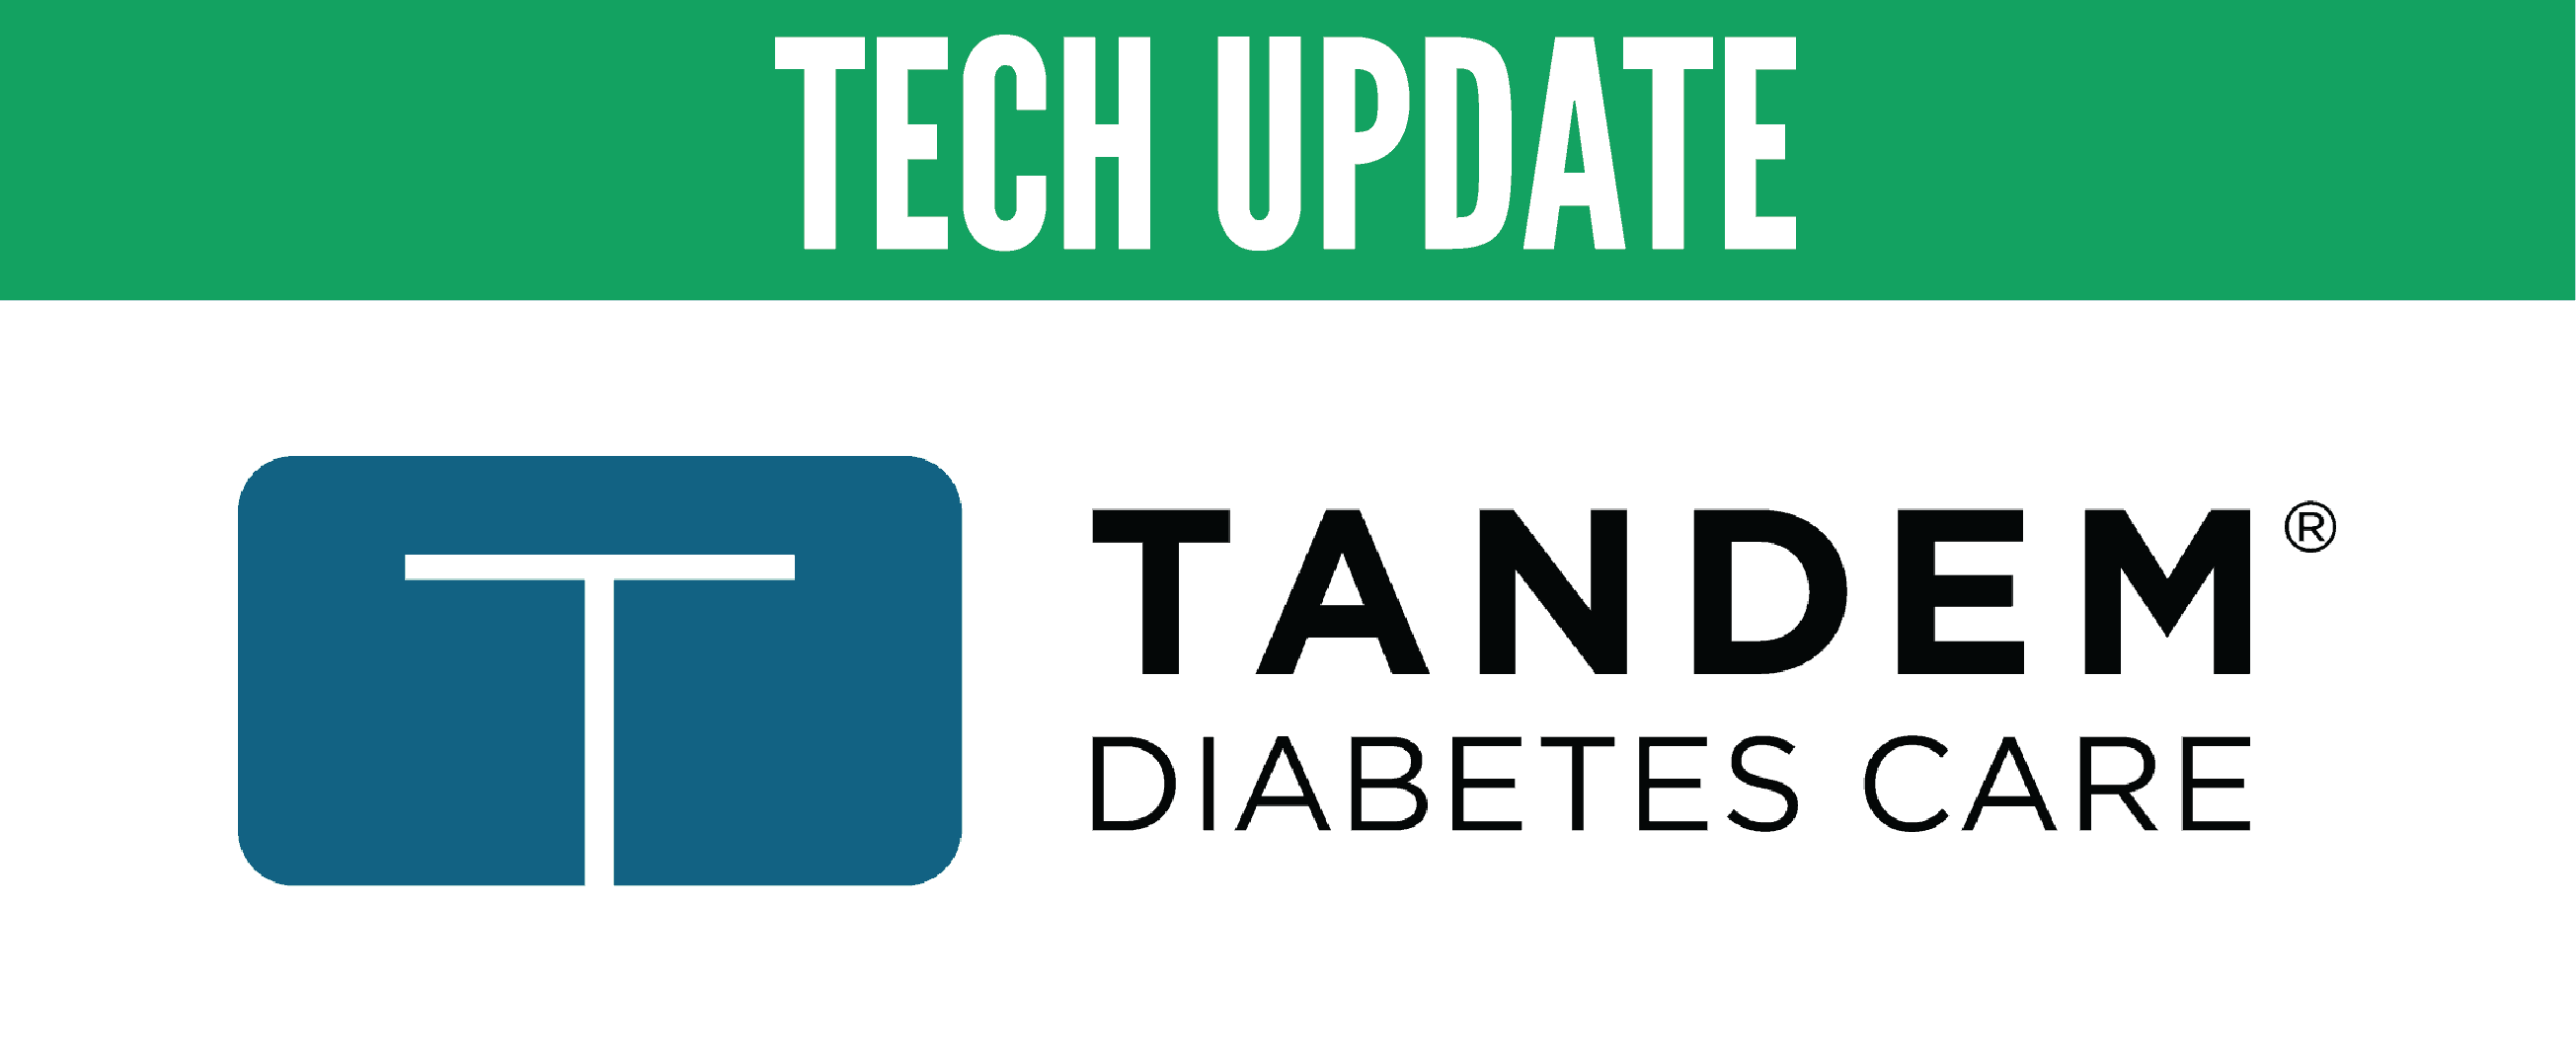 Tech Update: Tandem